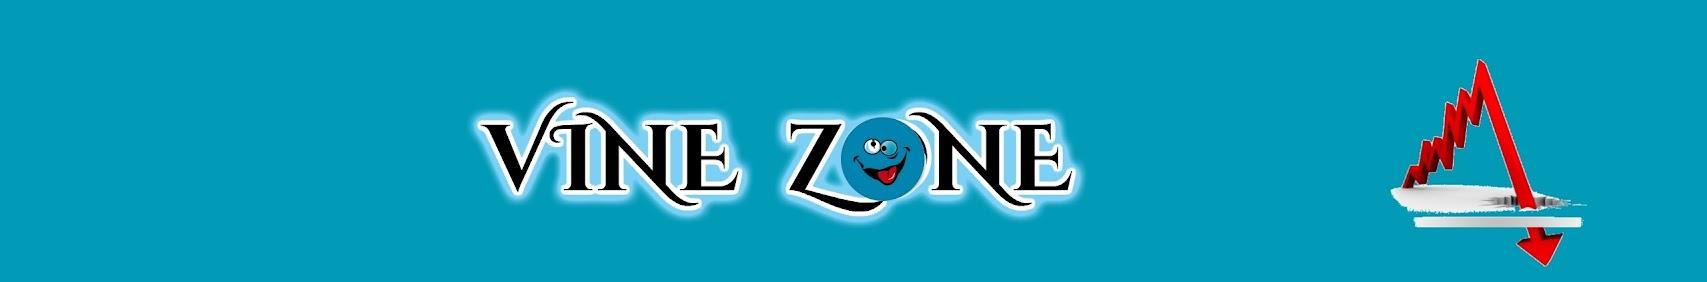 Vine Zone